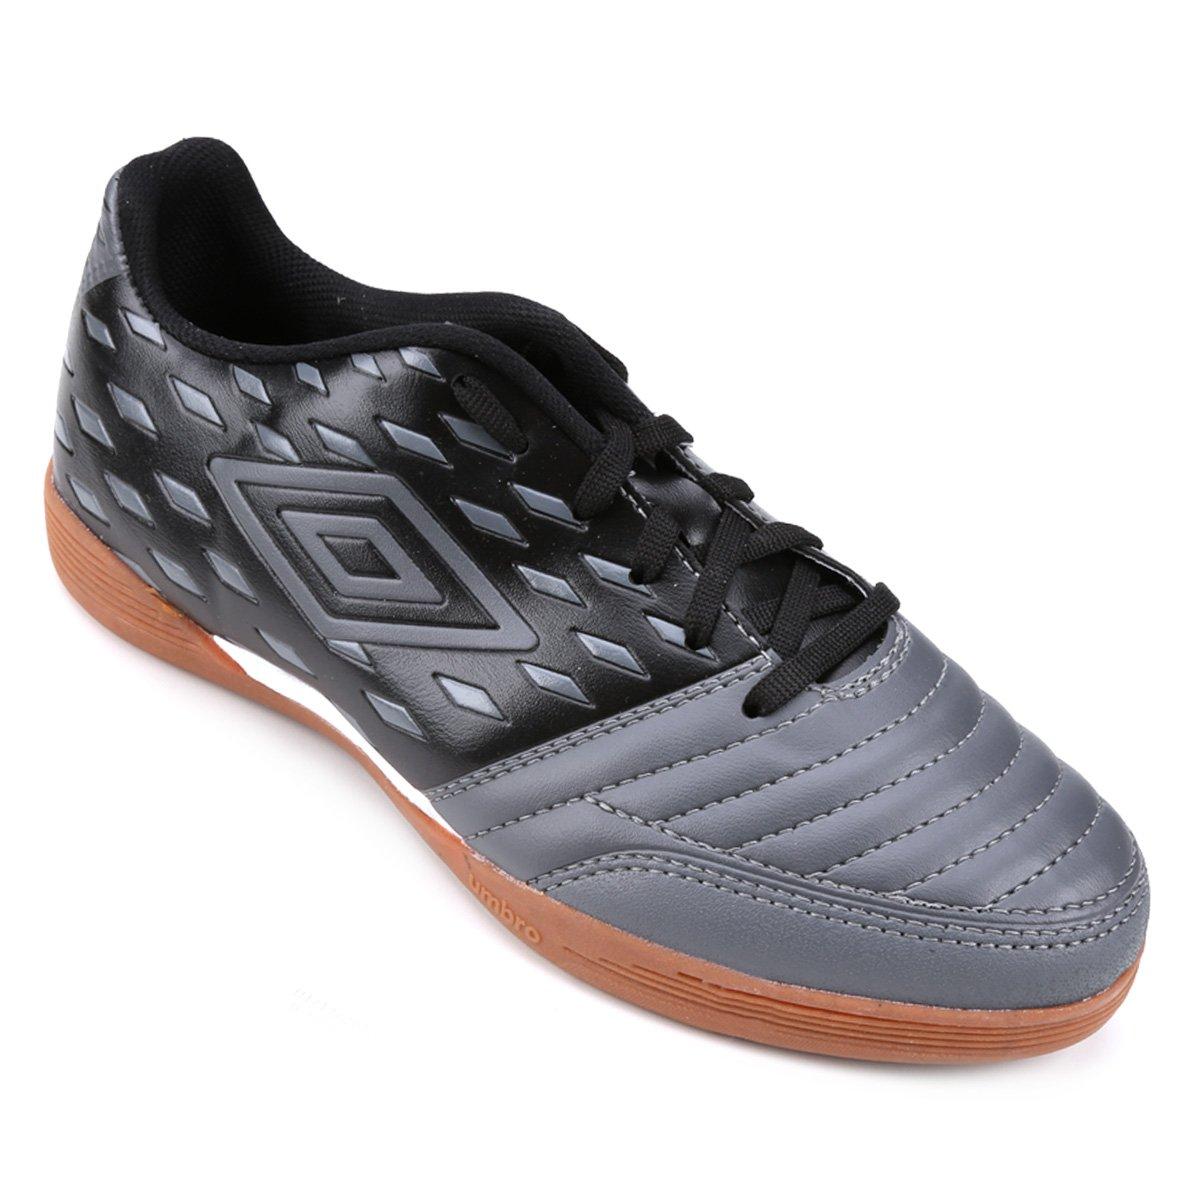 ... Chuteira Futsal Umbro Stratus Club Masculina - Compre Agora Netshoes  901825b564432f ... 5eaaad010d6ef